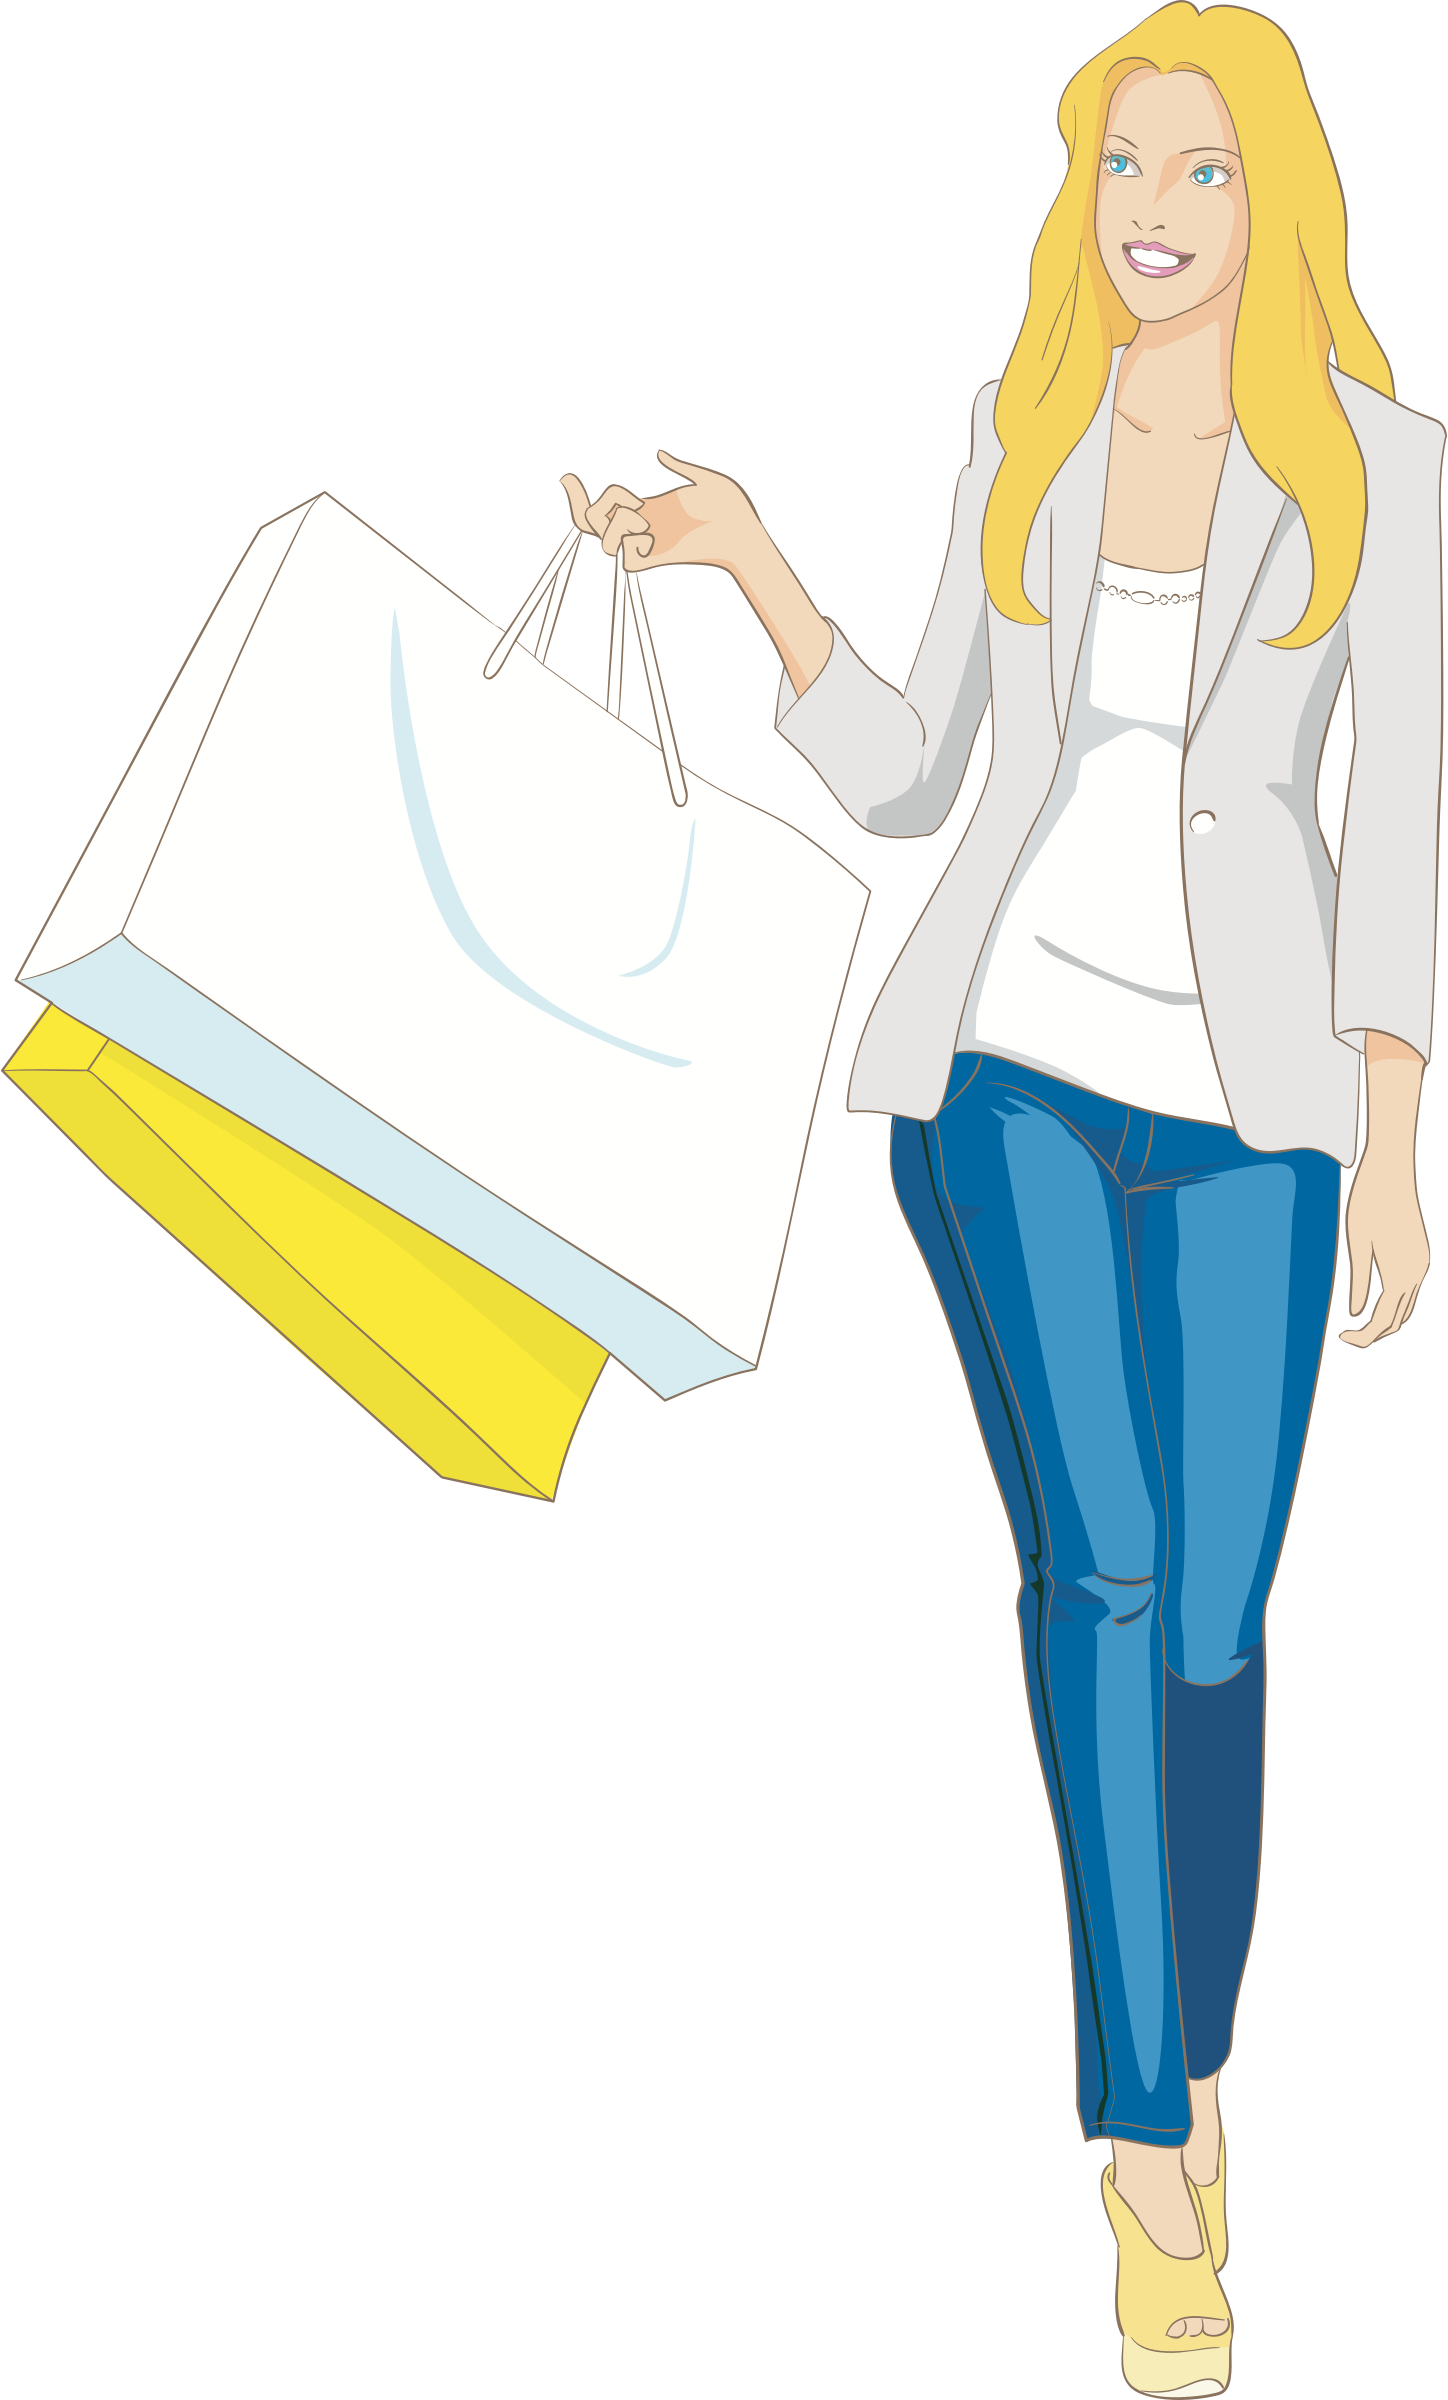 Fashion clipart shopper. Https openclipart org detail